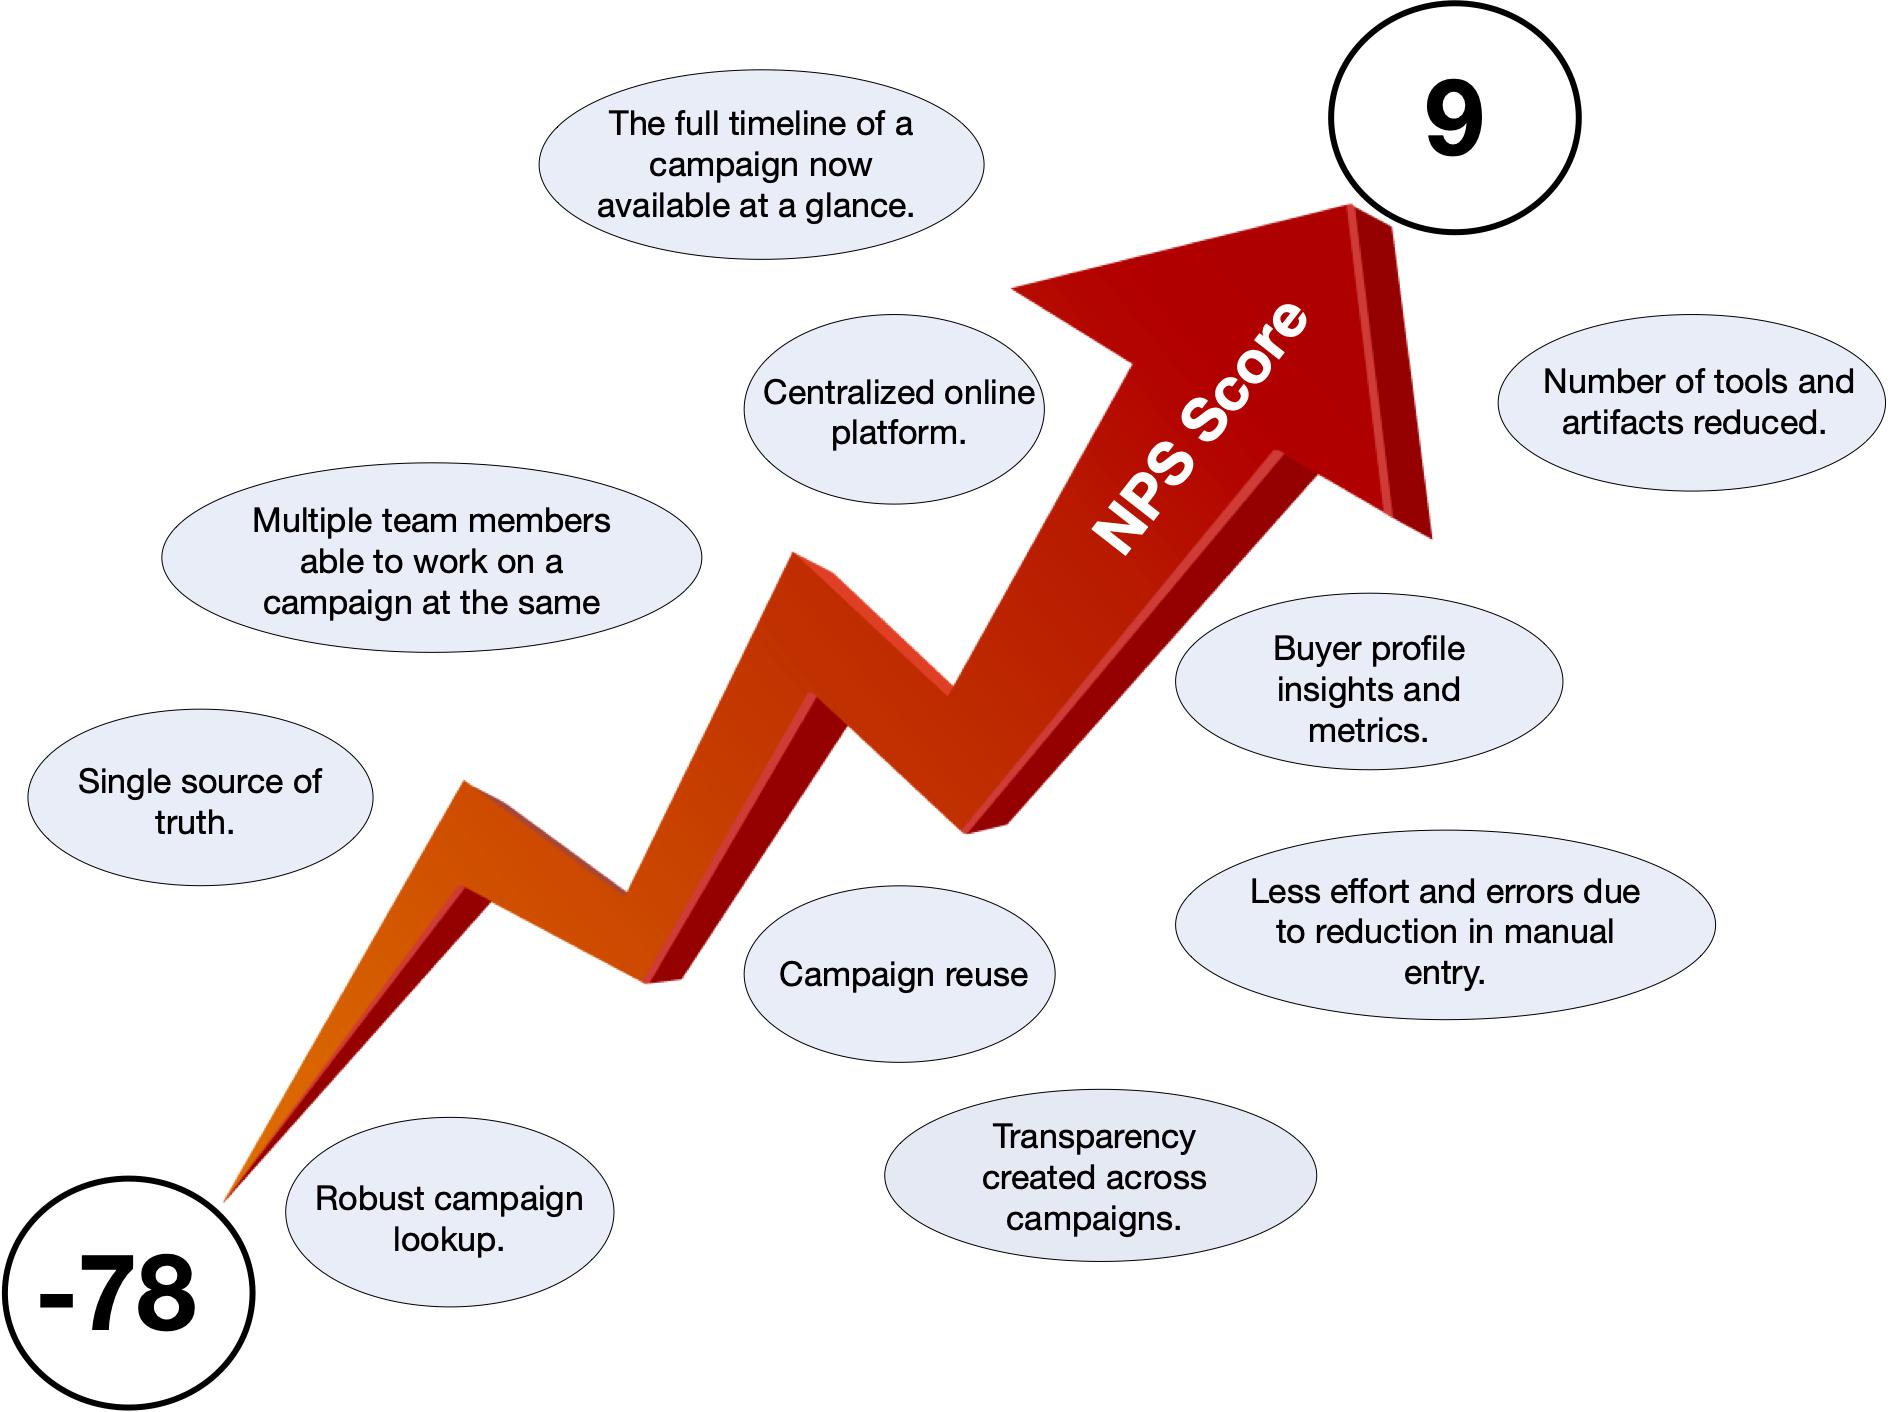 stylized diagram of upwards arrow showing NPS score rising from -78 to 9